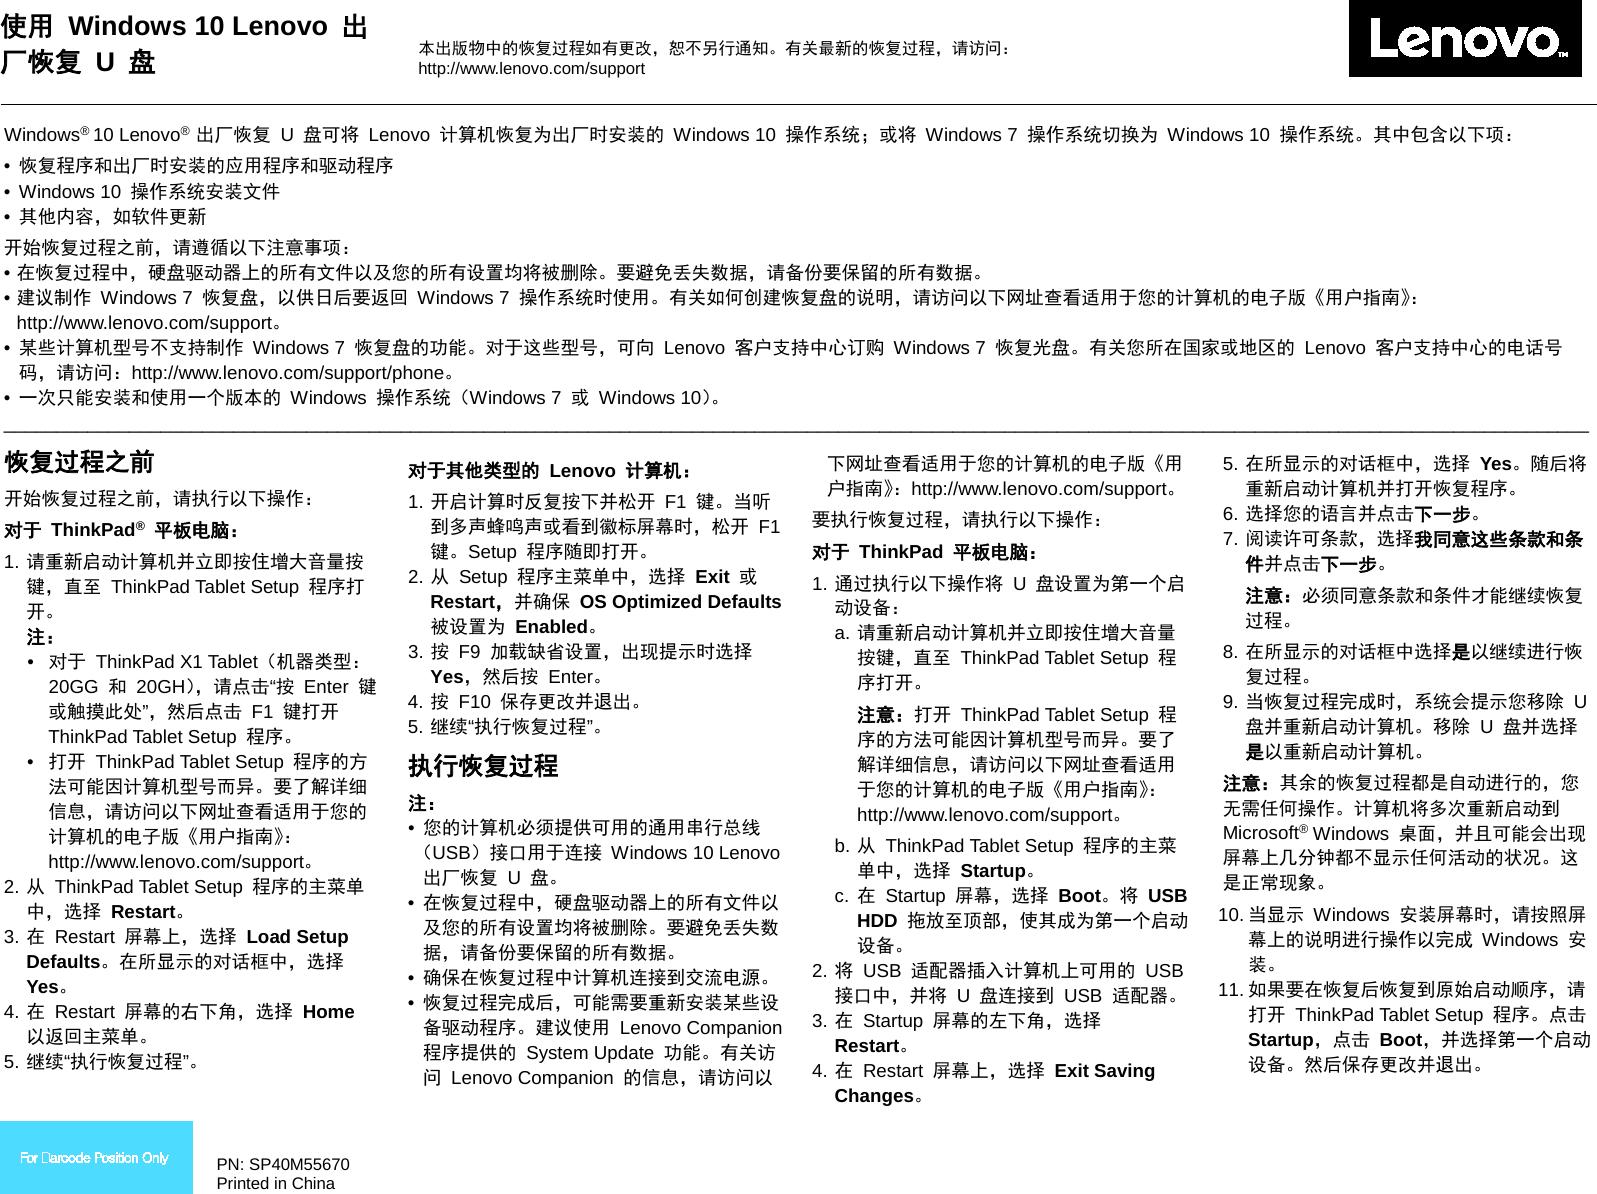 Lenovo Win10 Rusb Publet Zh Cn Sp40M55670 Using The Windows